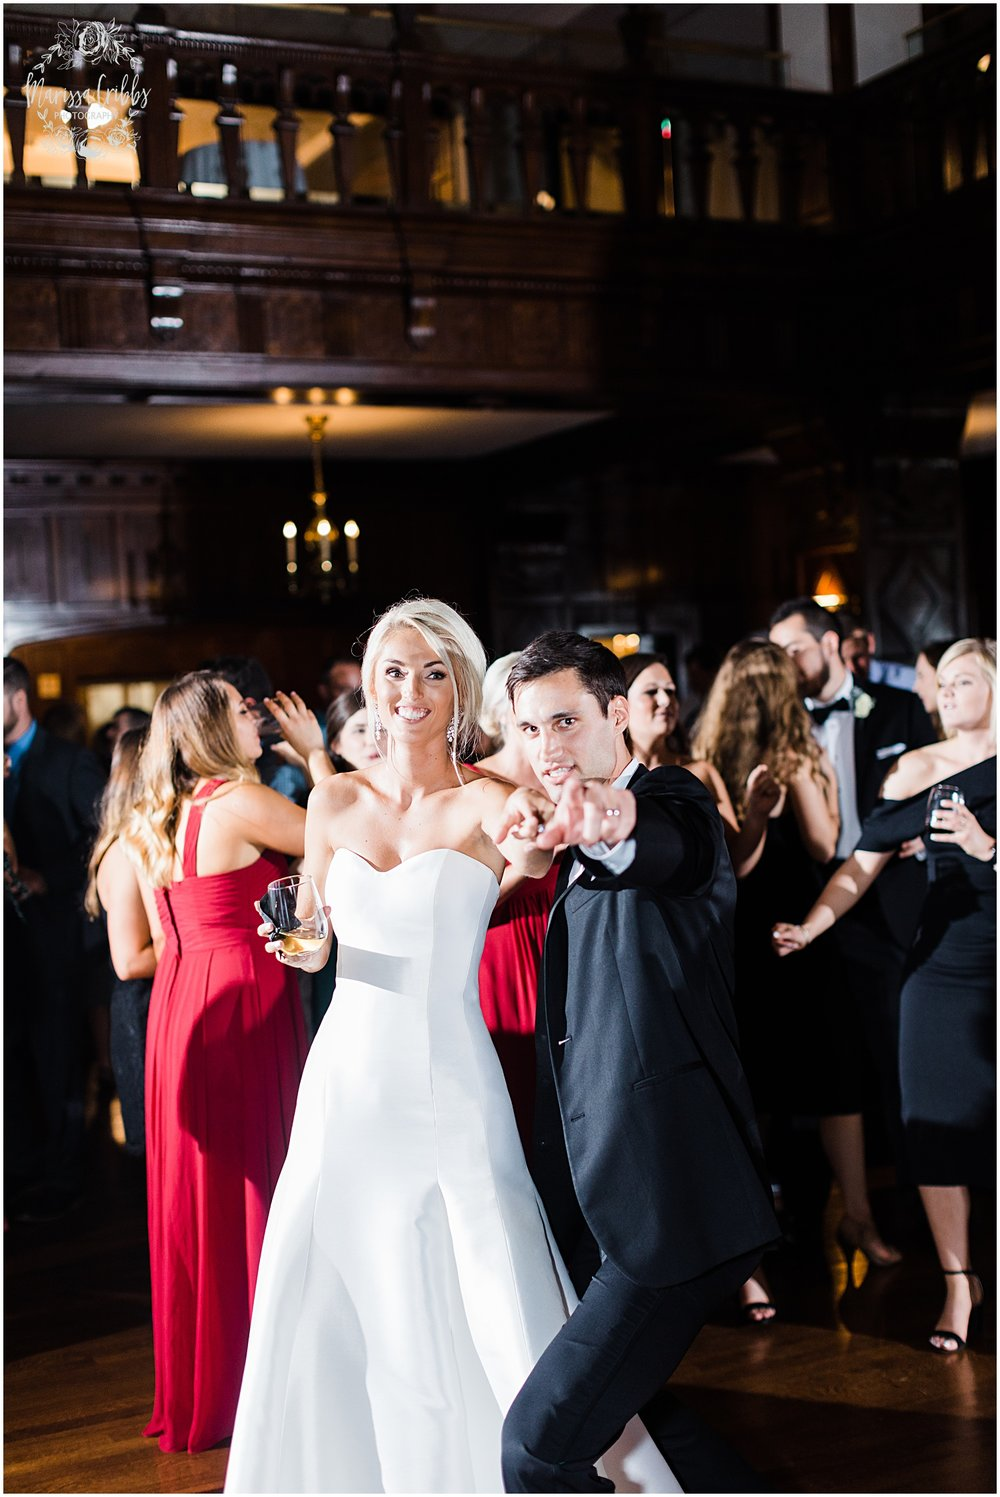 NOLL WEDDING | THE BRASS ON BALTIMORE | MARISSA CRIBBS PHOTOGRAPHY_6388.jpg